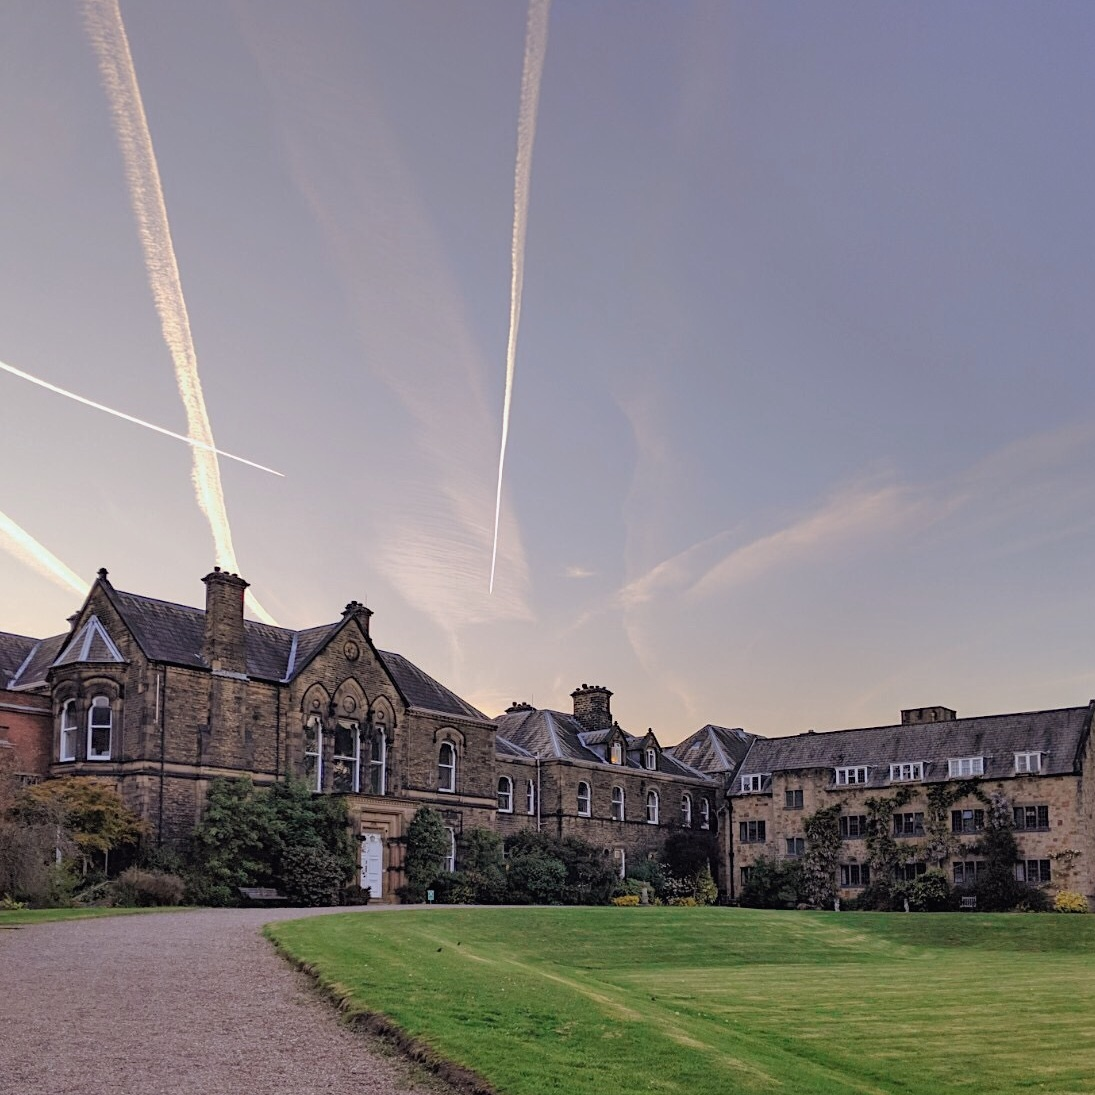 Mirfield monastic community